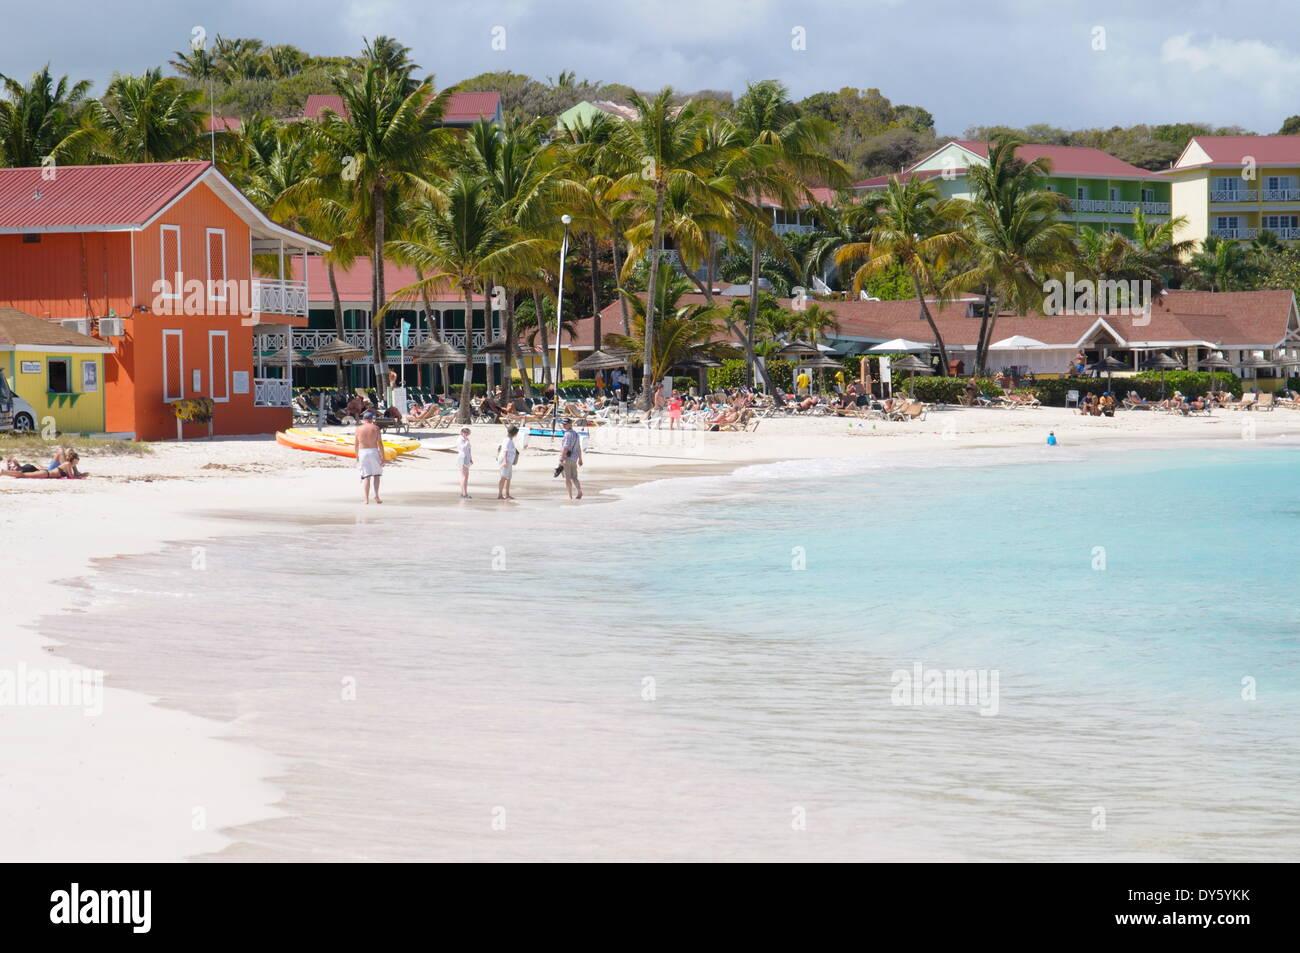 Pineapple Beach Club, Long Bay, Antigua, Leeward Islands, West Indies, Caribbean, Central America - Stock Image